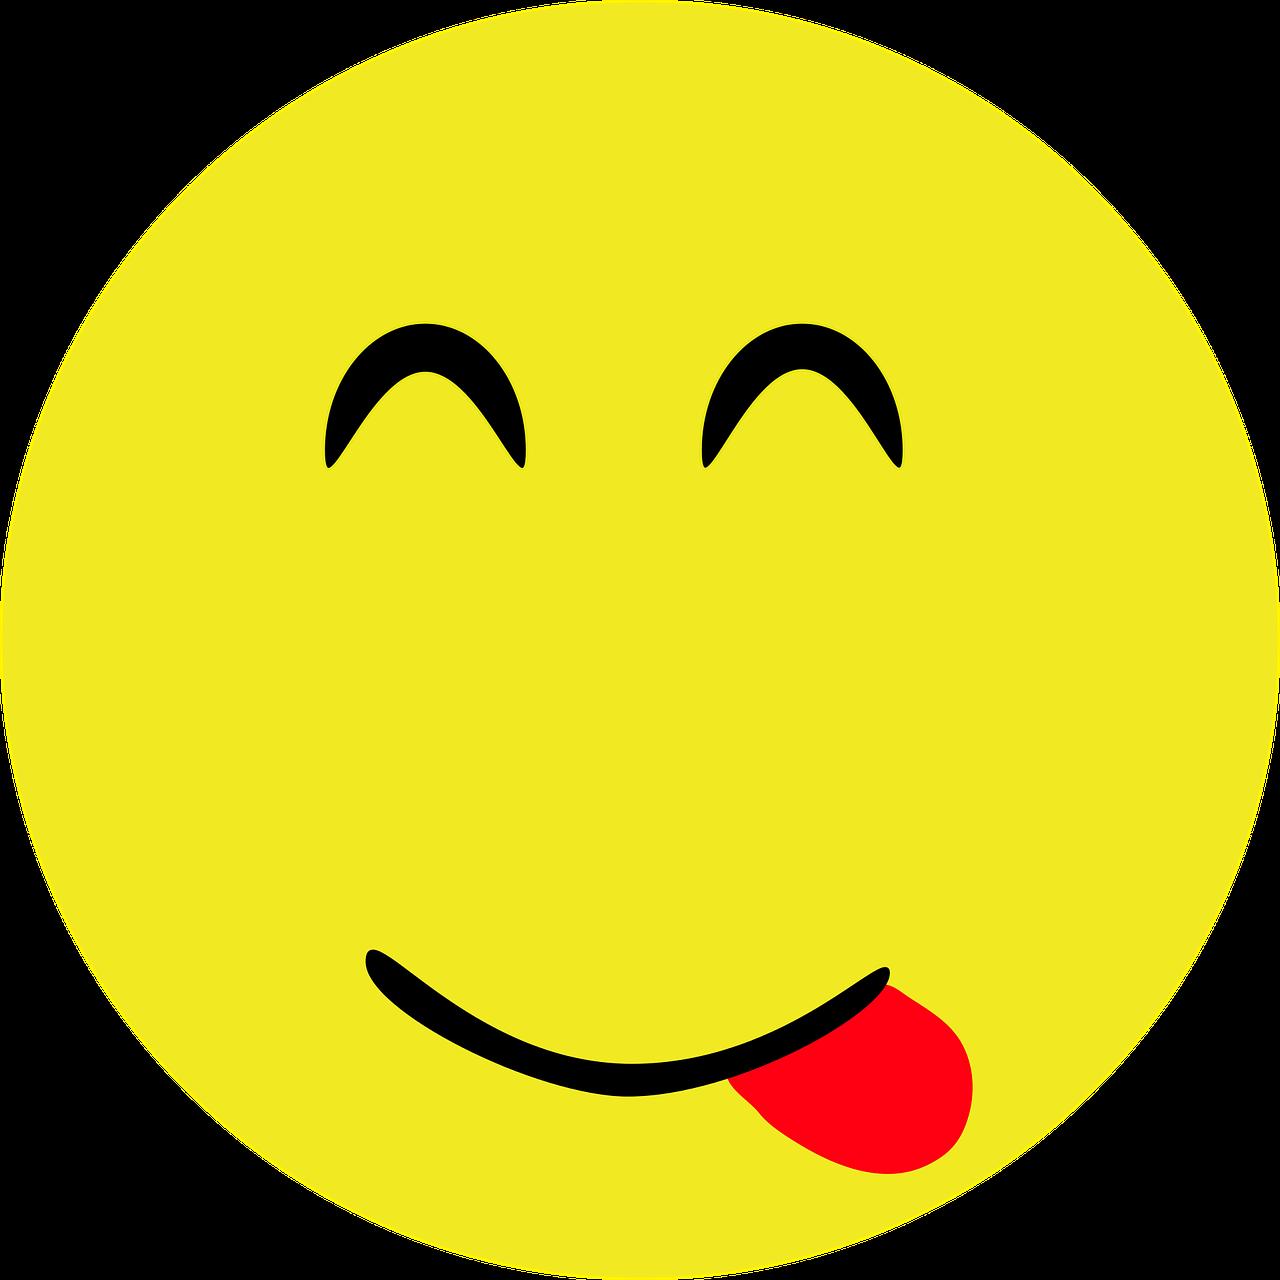 Whatsapp Profile Pic Emoji - Drawing Apem